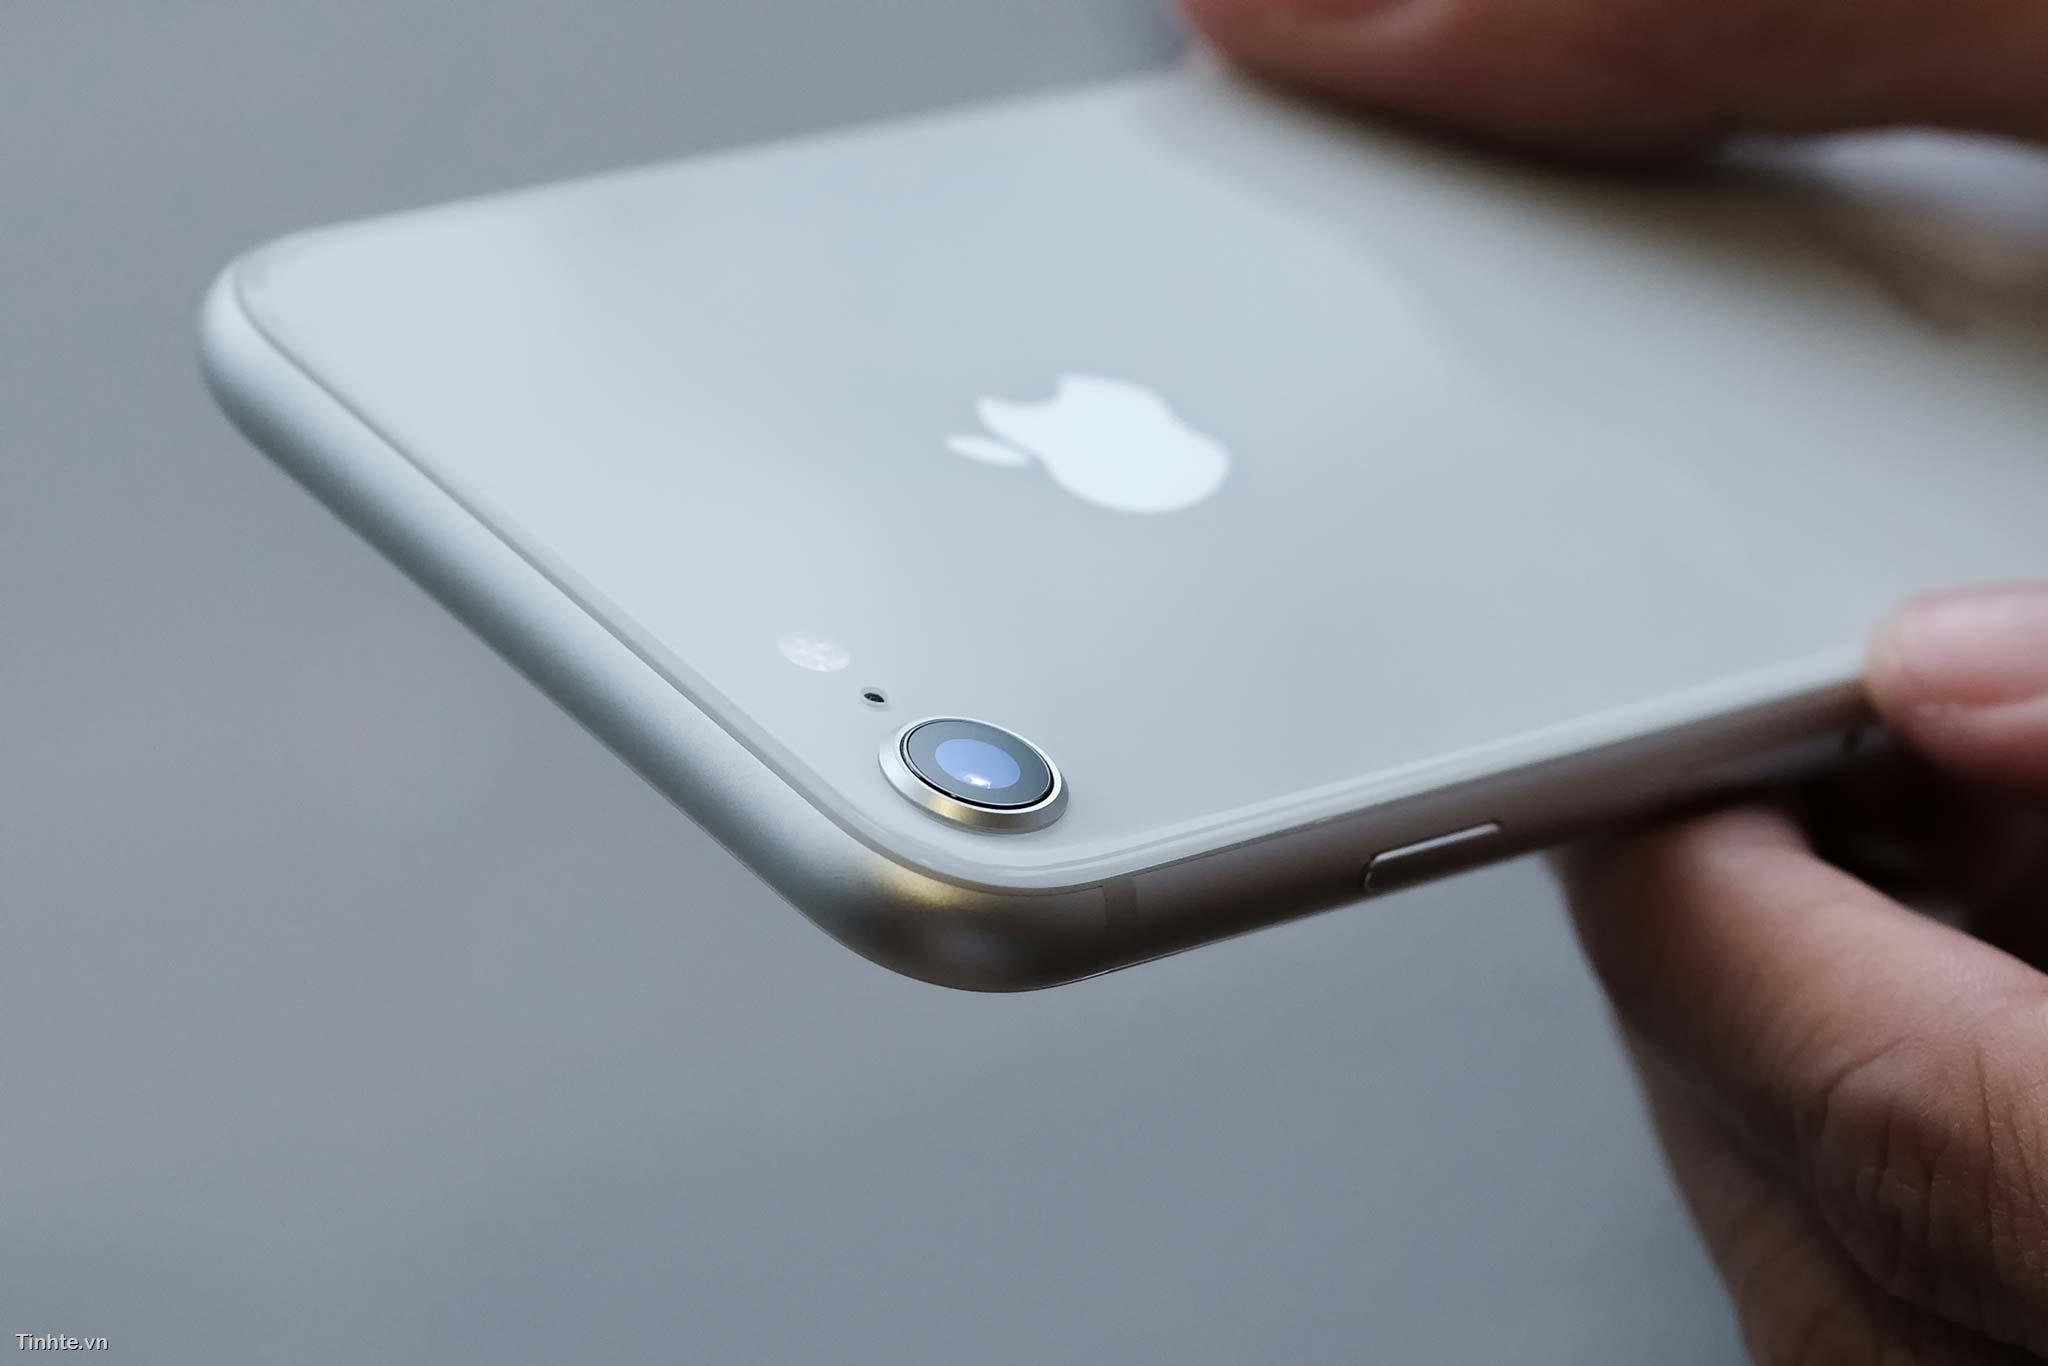 tinhte_tren_tay_apple_iphone_8_iphone8_plus11.jpg